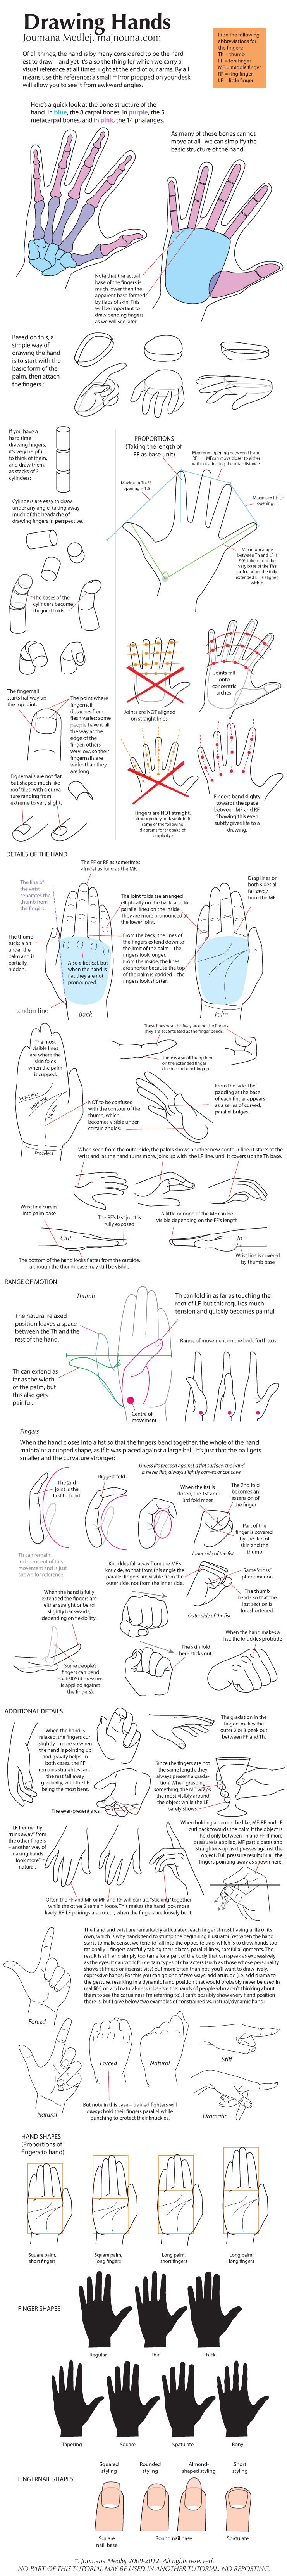 Drawing Hands by Majnouna